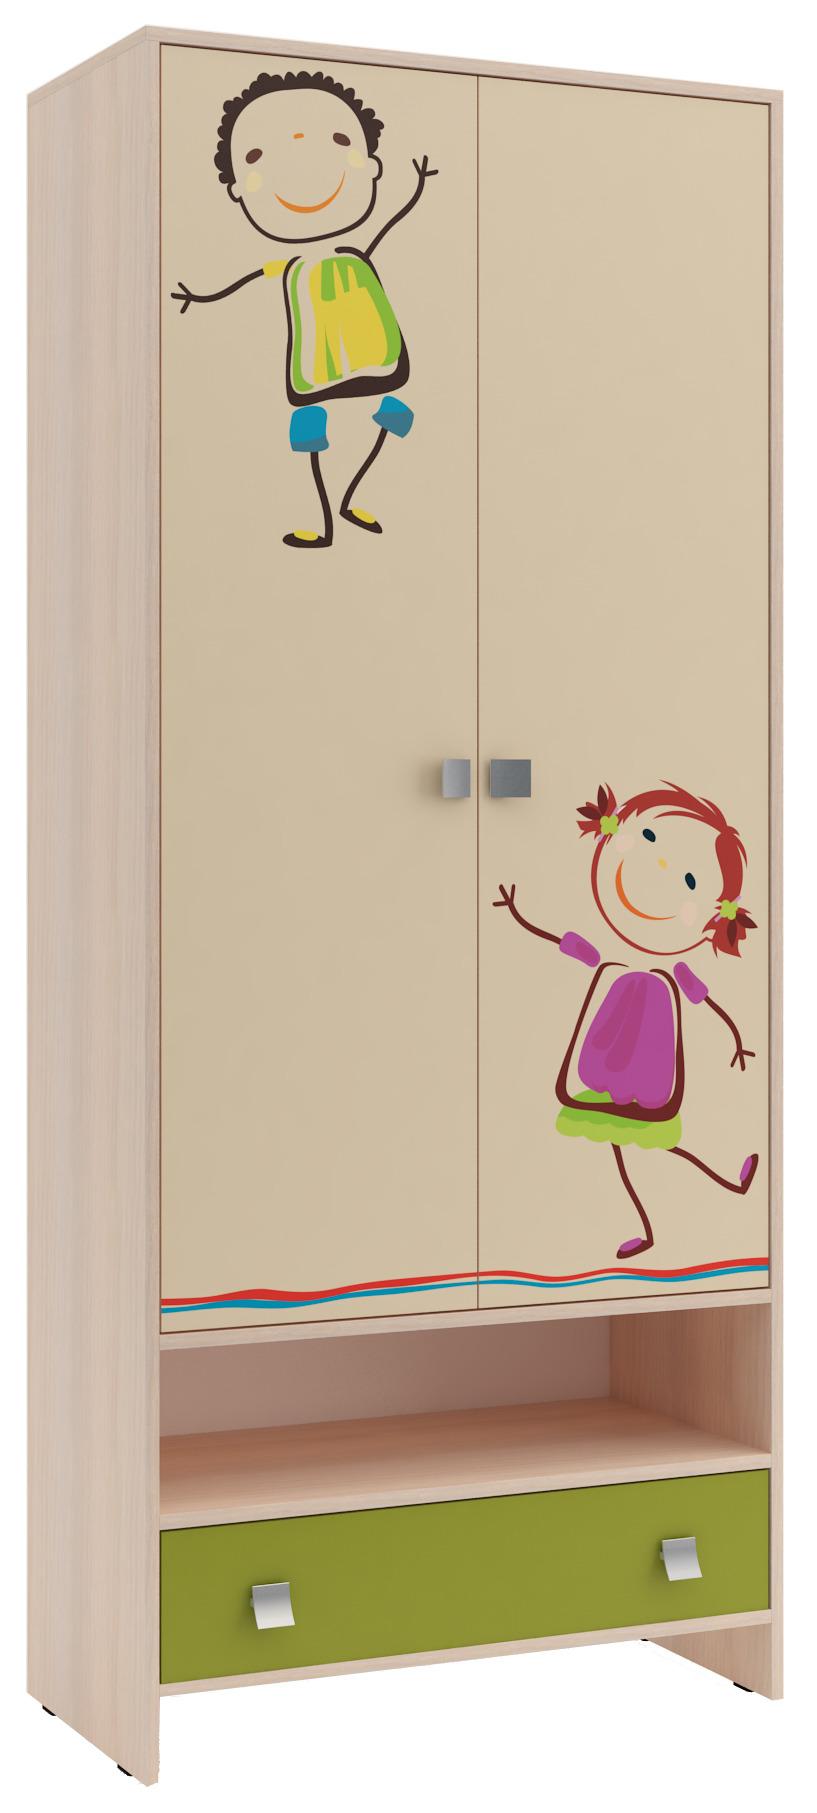 Шкаф для детской ДружбаМебель для детской<br><br><br>Длина мм: 800<br>Высота мм: 1900<br>Глубина мм: 400